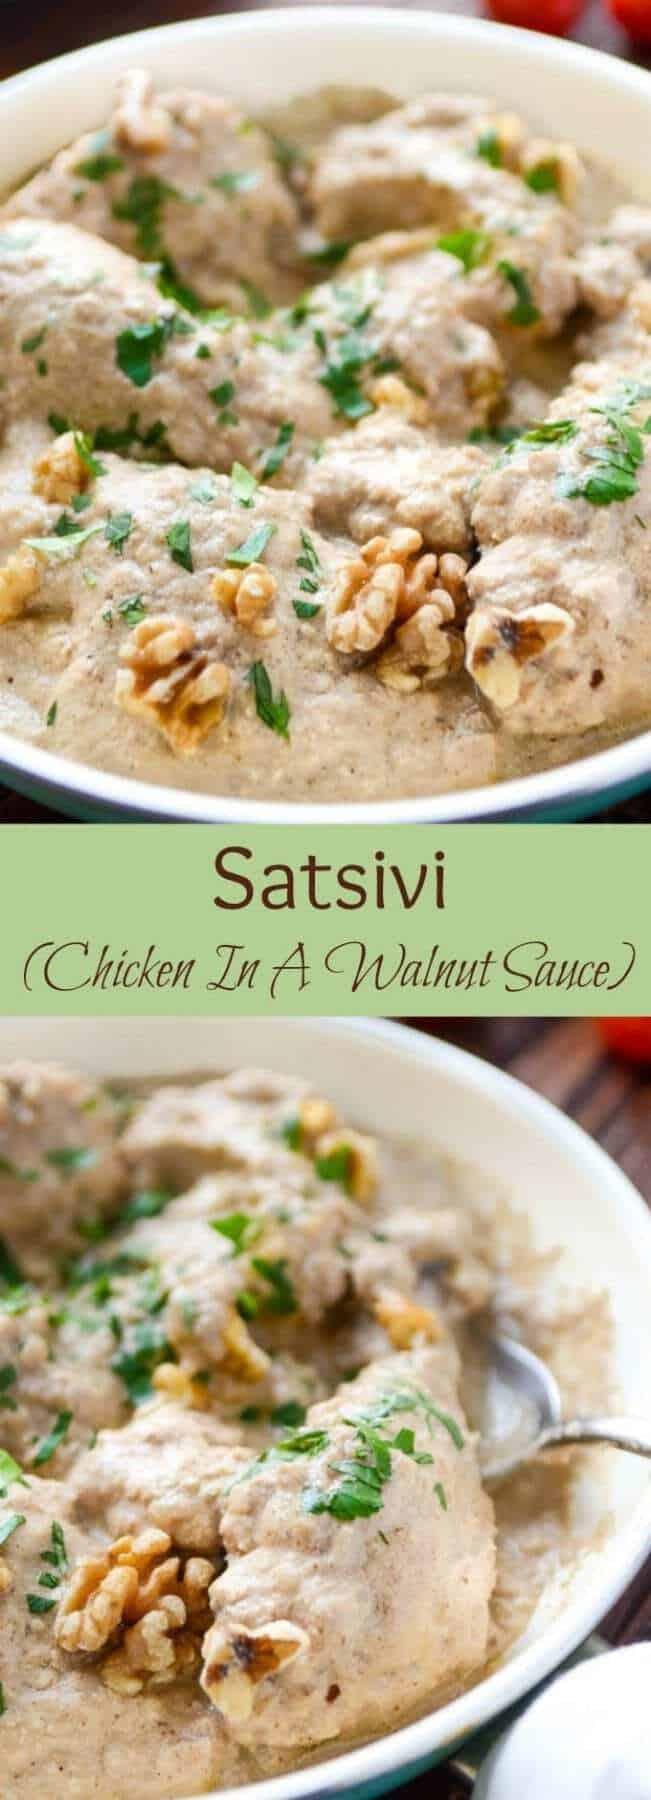 Satsivi | Chicken With A Walnut Garlic Sauce | Chicken With Walnut Sauce | Walnut Sauce | Creamy Walnut Sauce